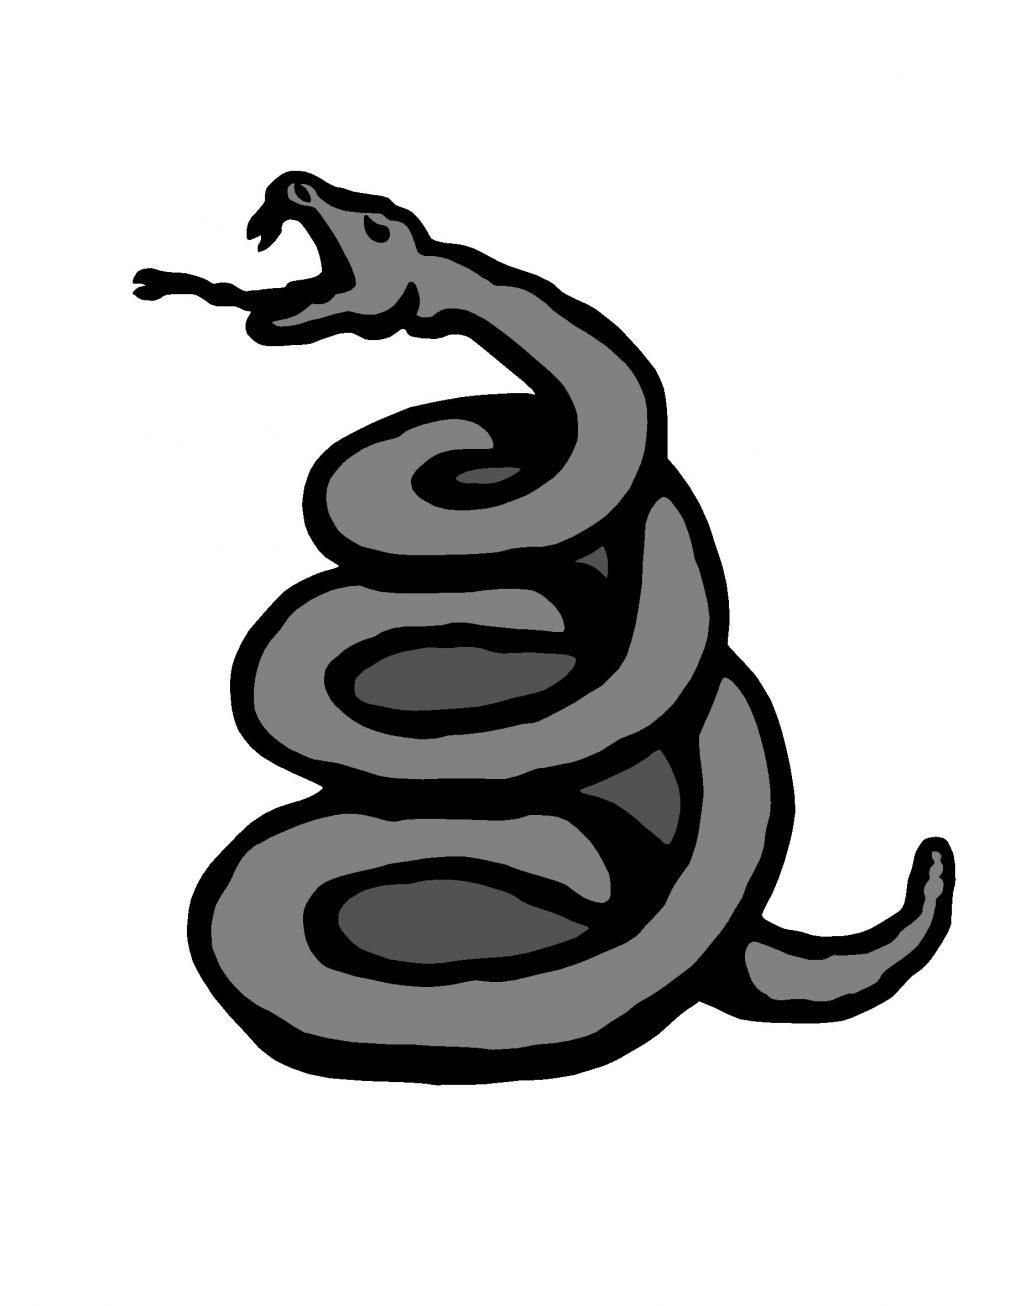 RTMTLBADGSNA - Metallica-Snake-Enamel Badge